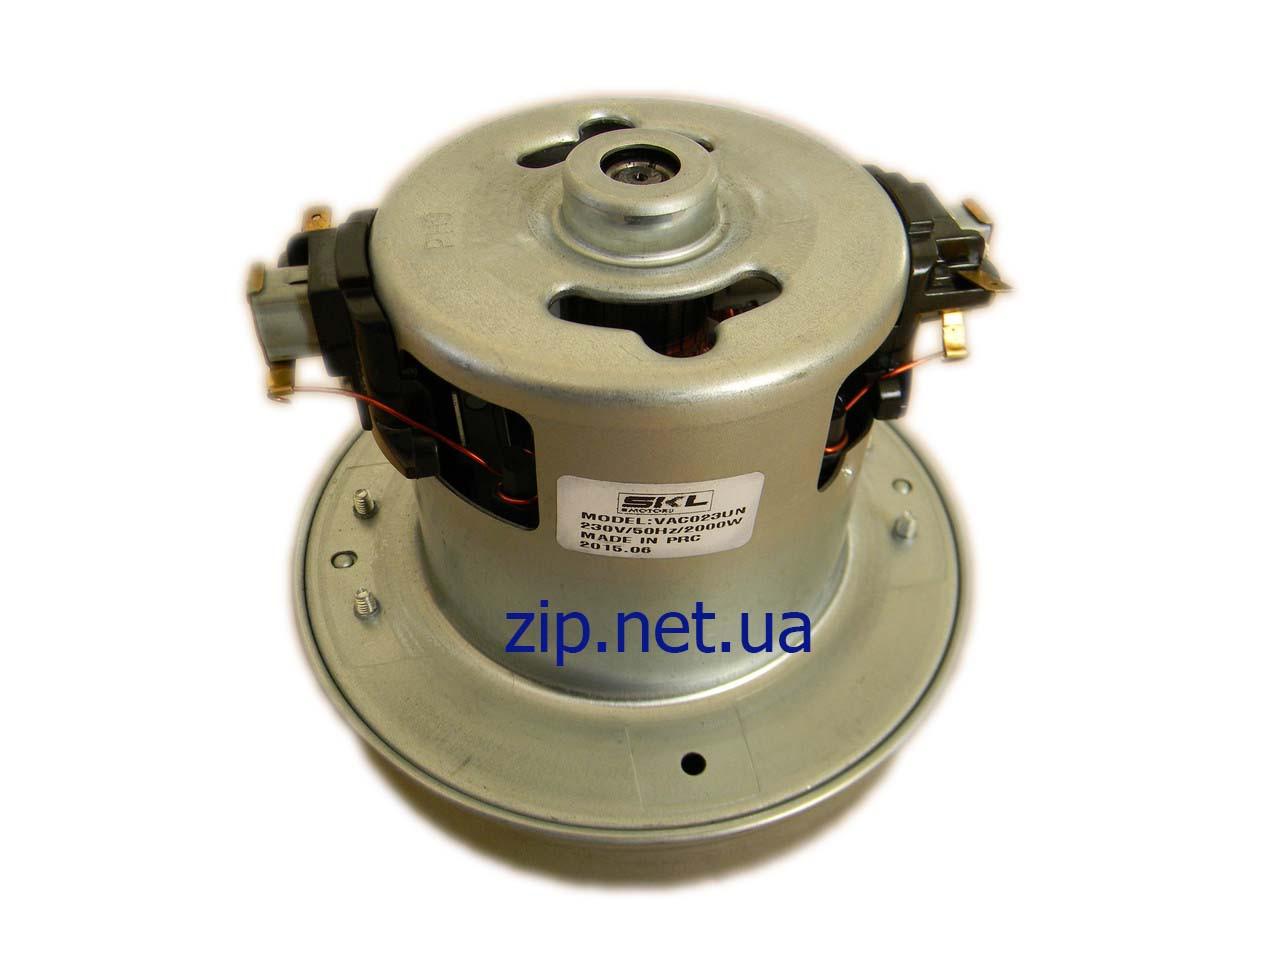 Мотор для пылесоса 2000 W d- 130 mm.H- 120 mm.